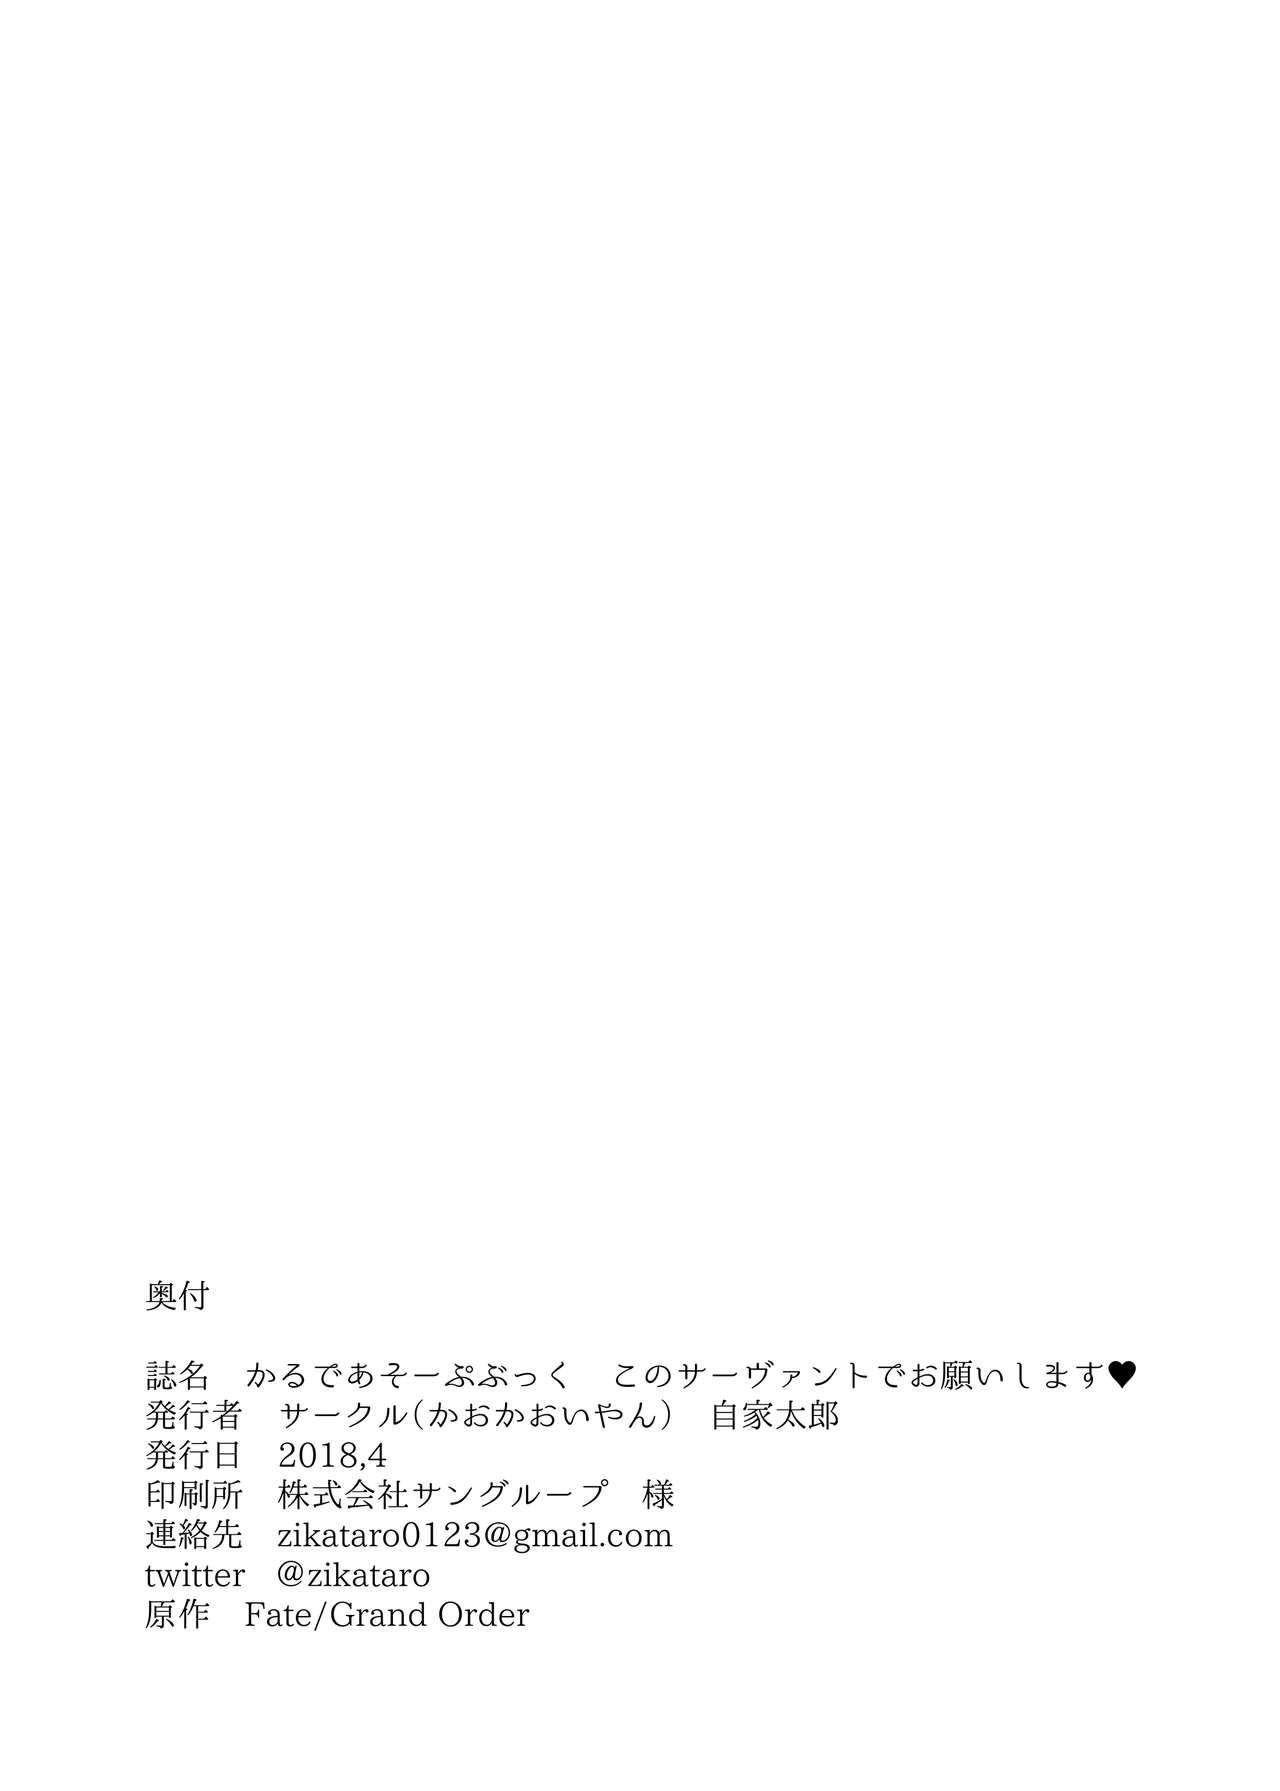 Chaldea Soap Book Kono Servant de Onegaishimasu 19